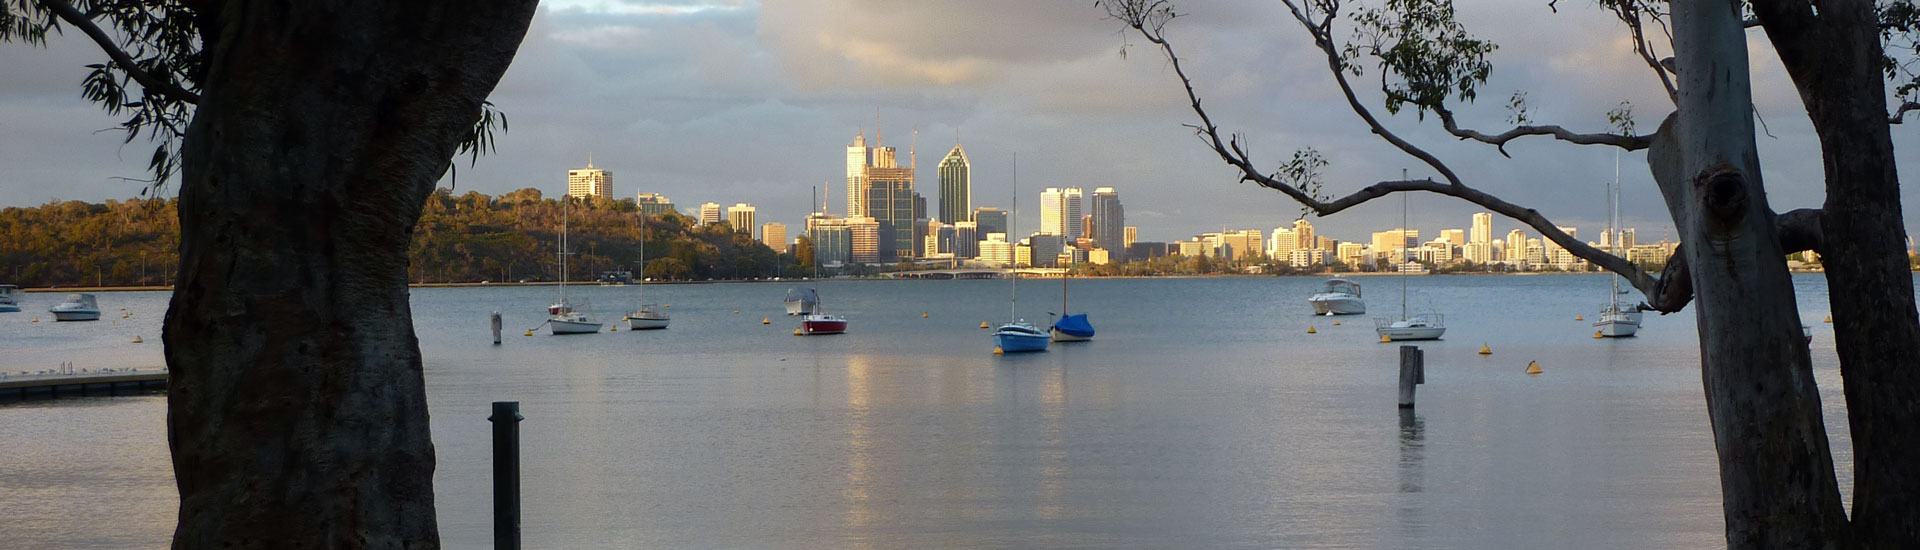 Perth-Slide-1